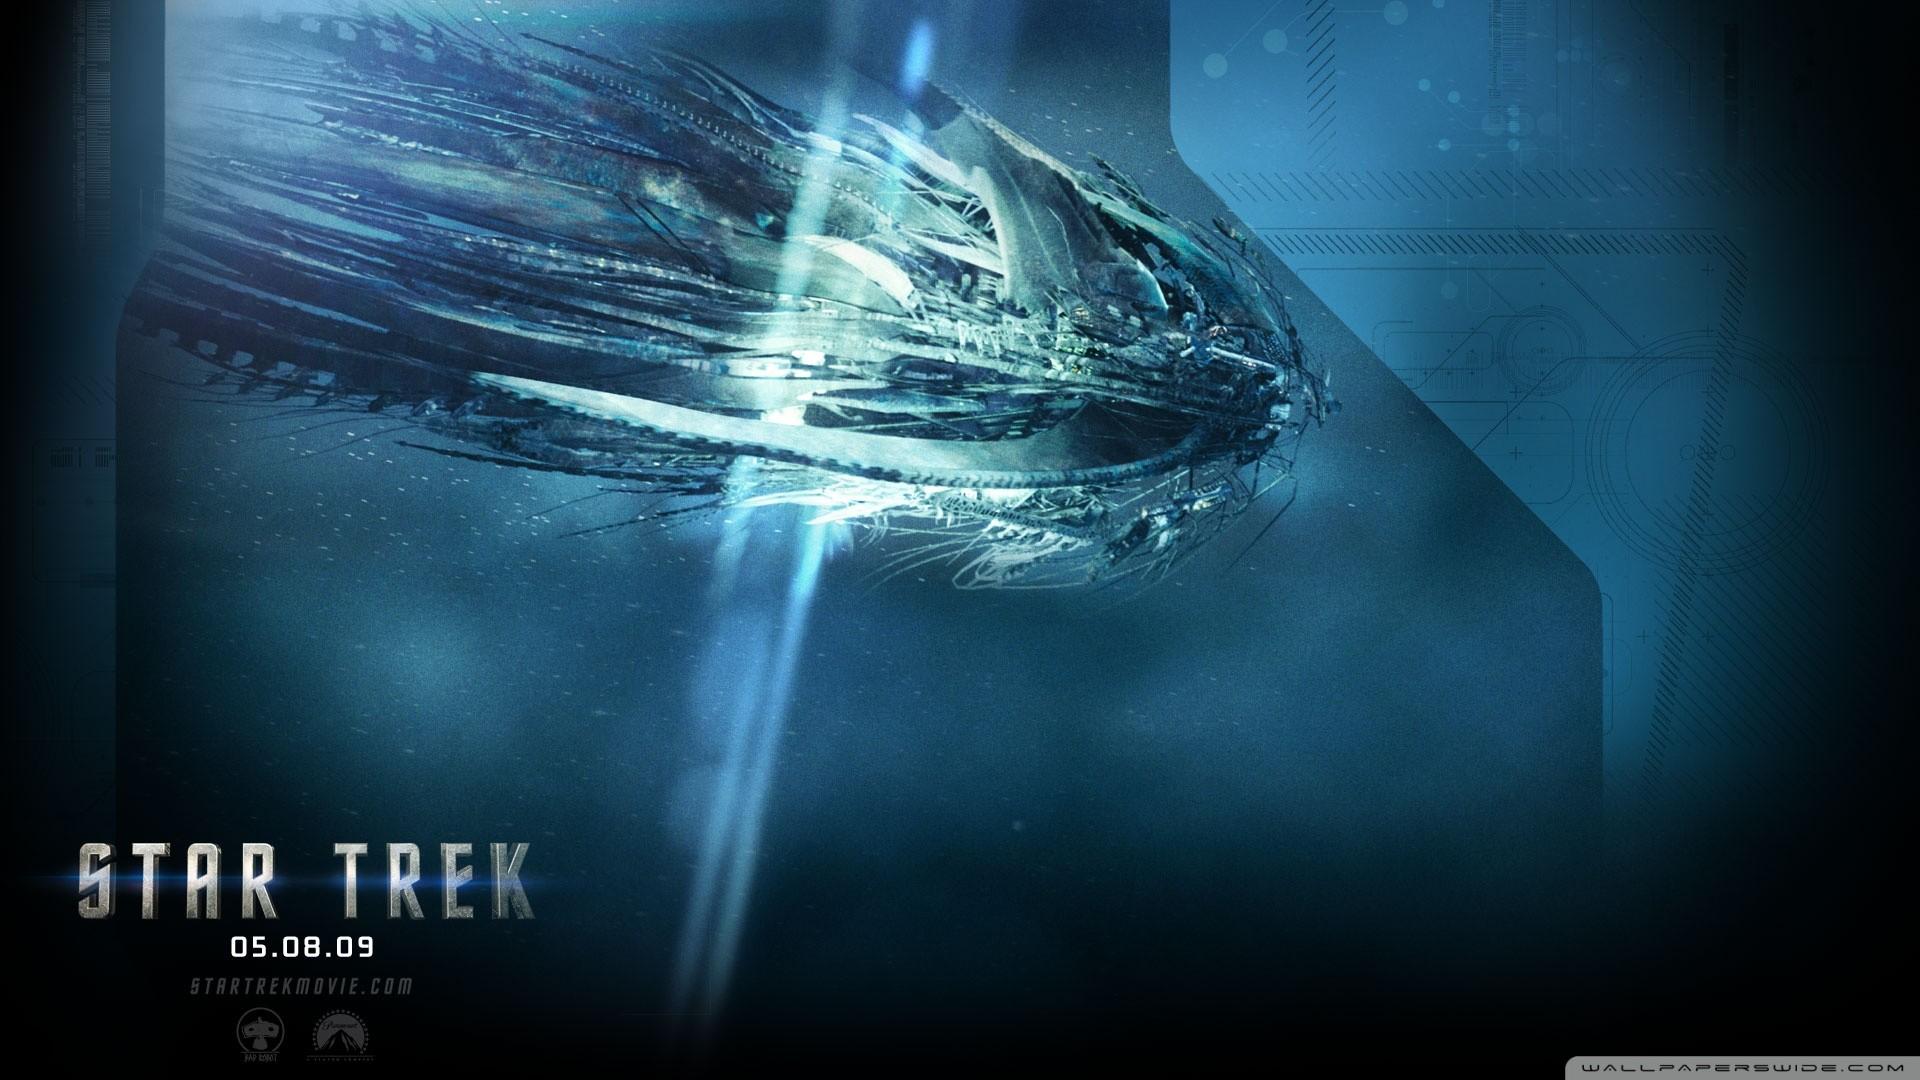 Star Trek Wallpapers HD (71+ Images